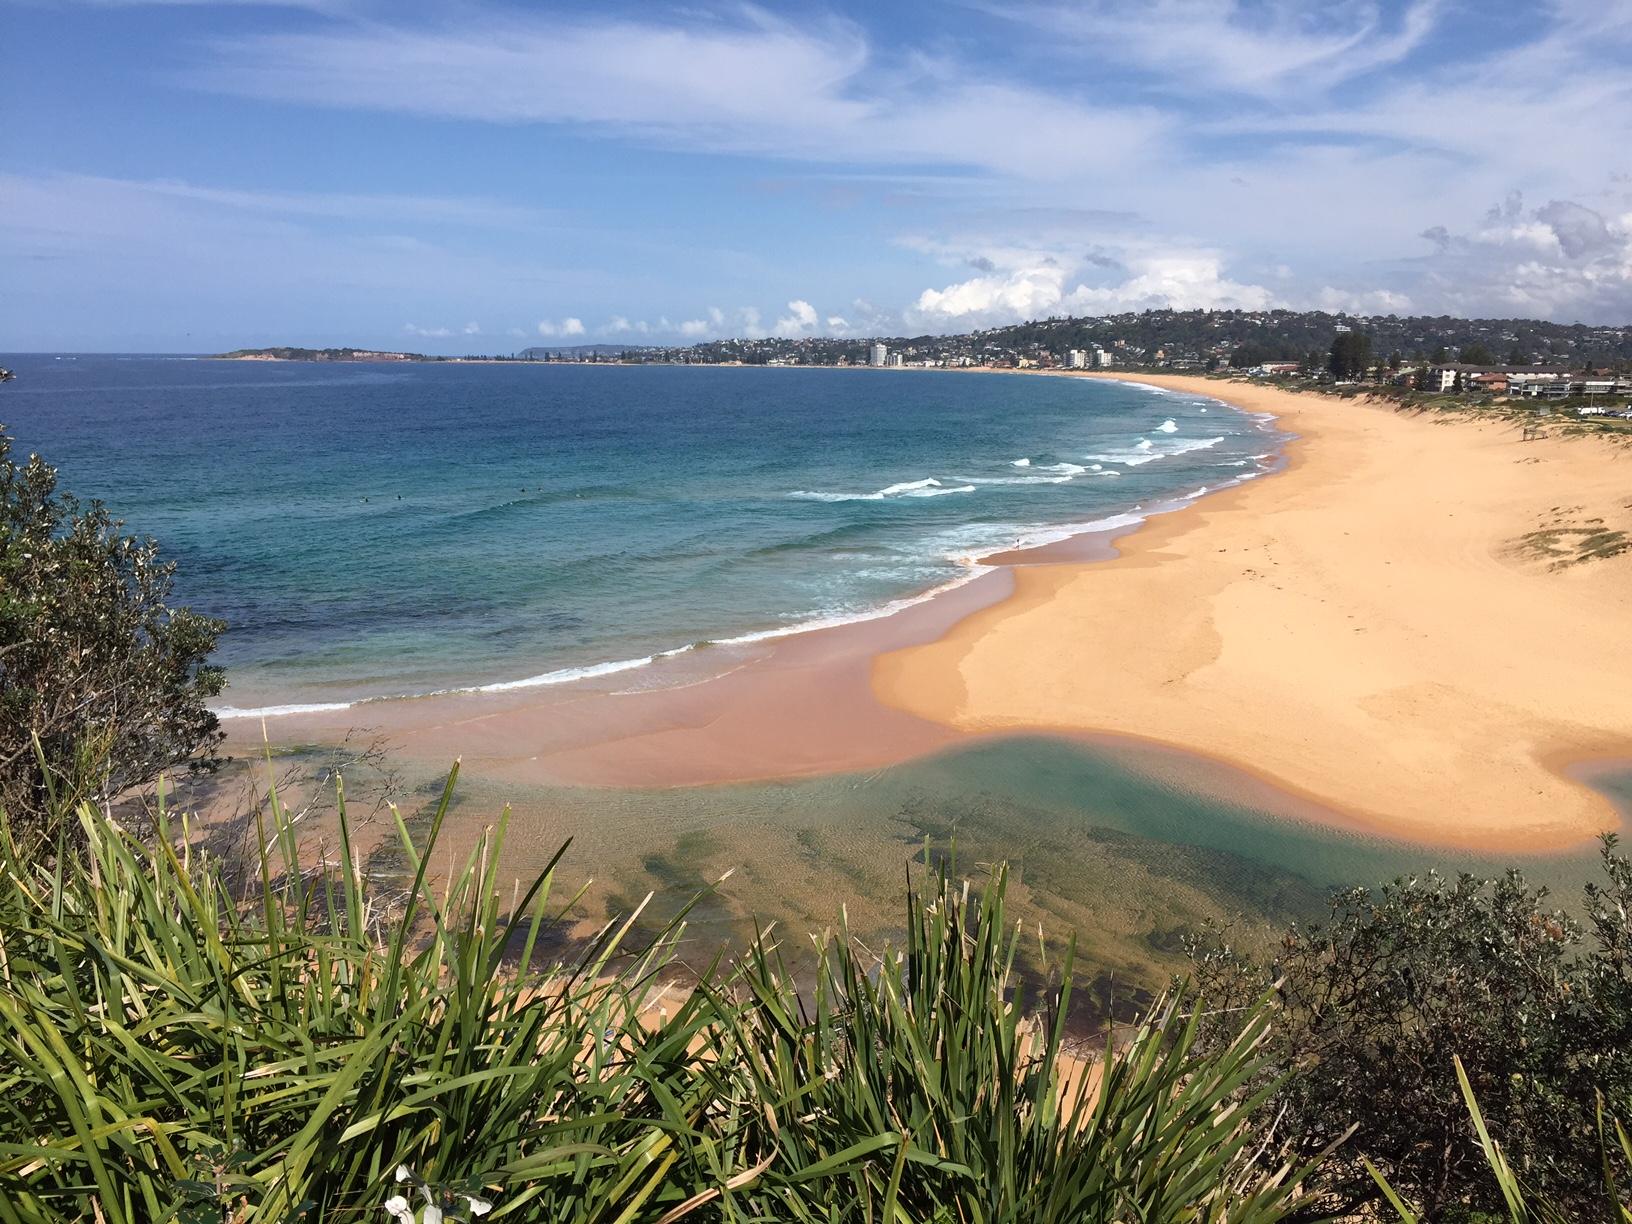 Narrabeen and Collaroy beaches